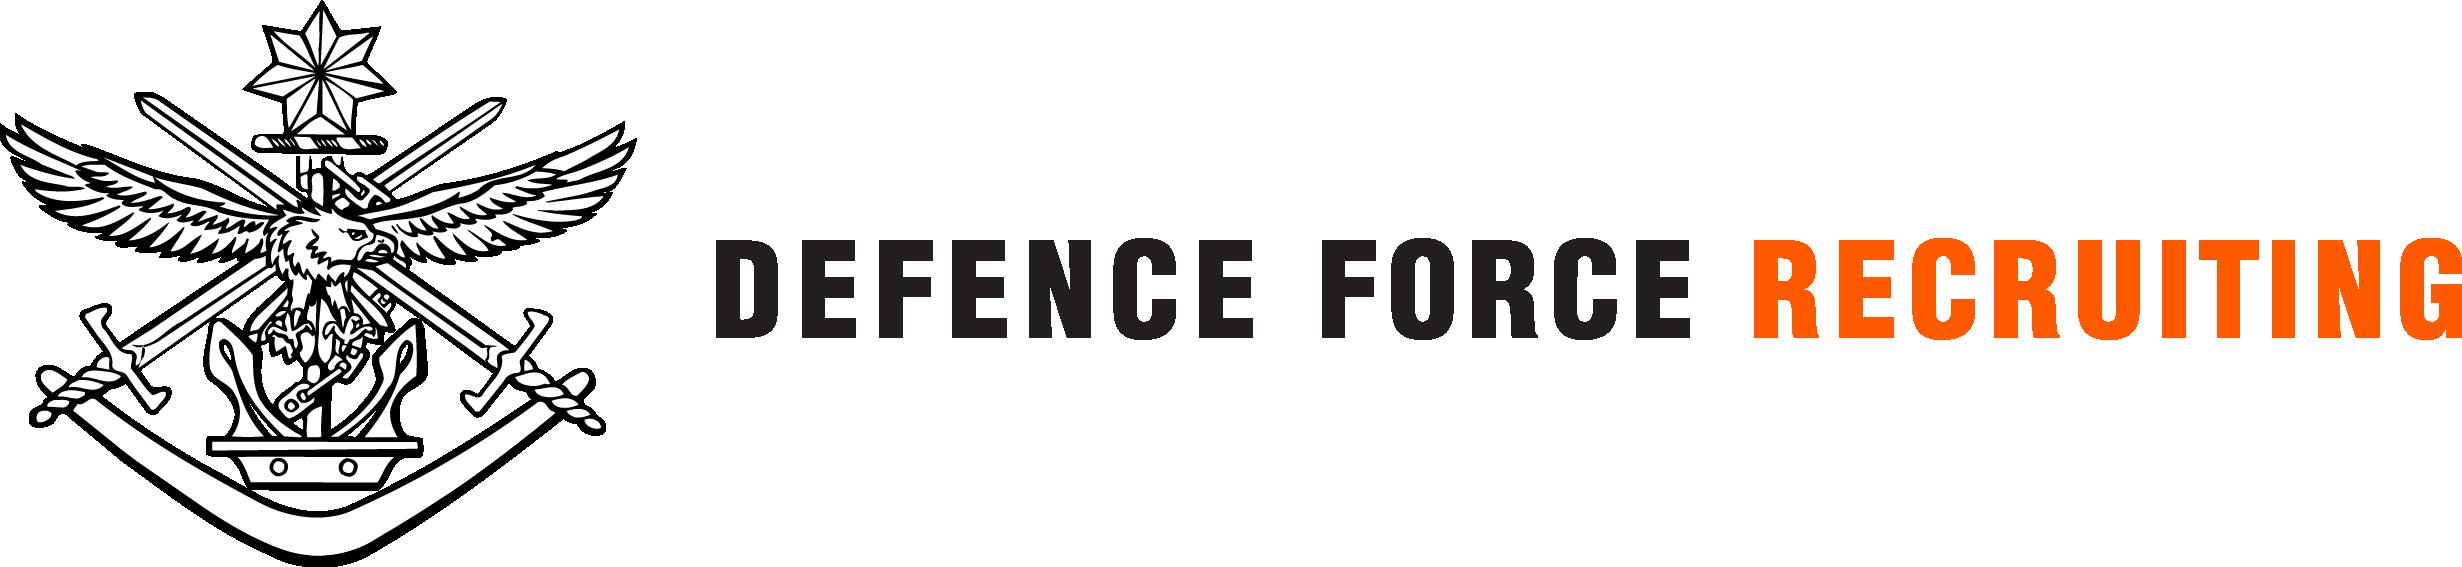 DFR Logo 2.PNG